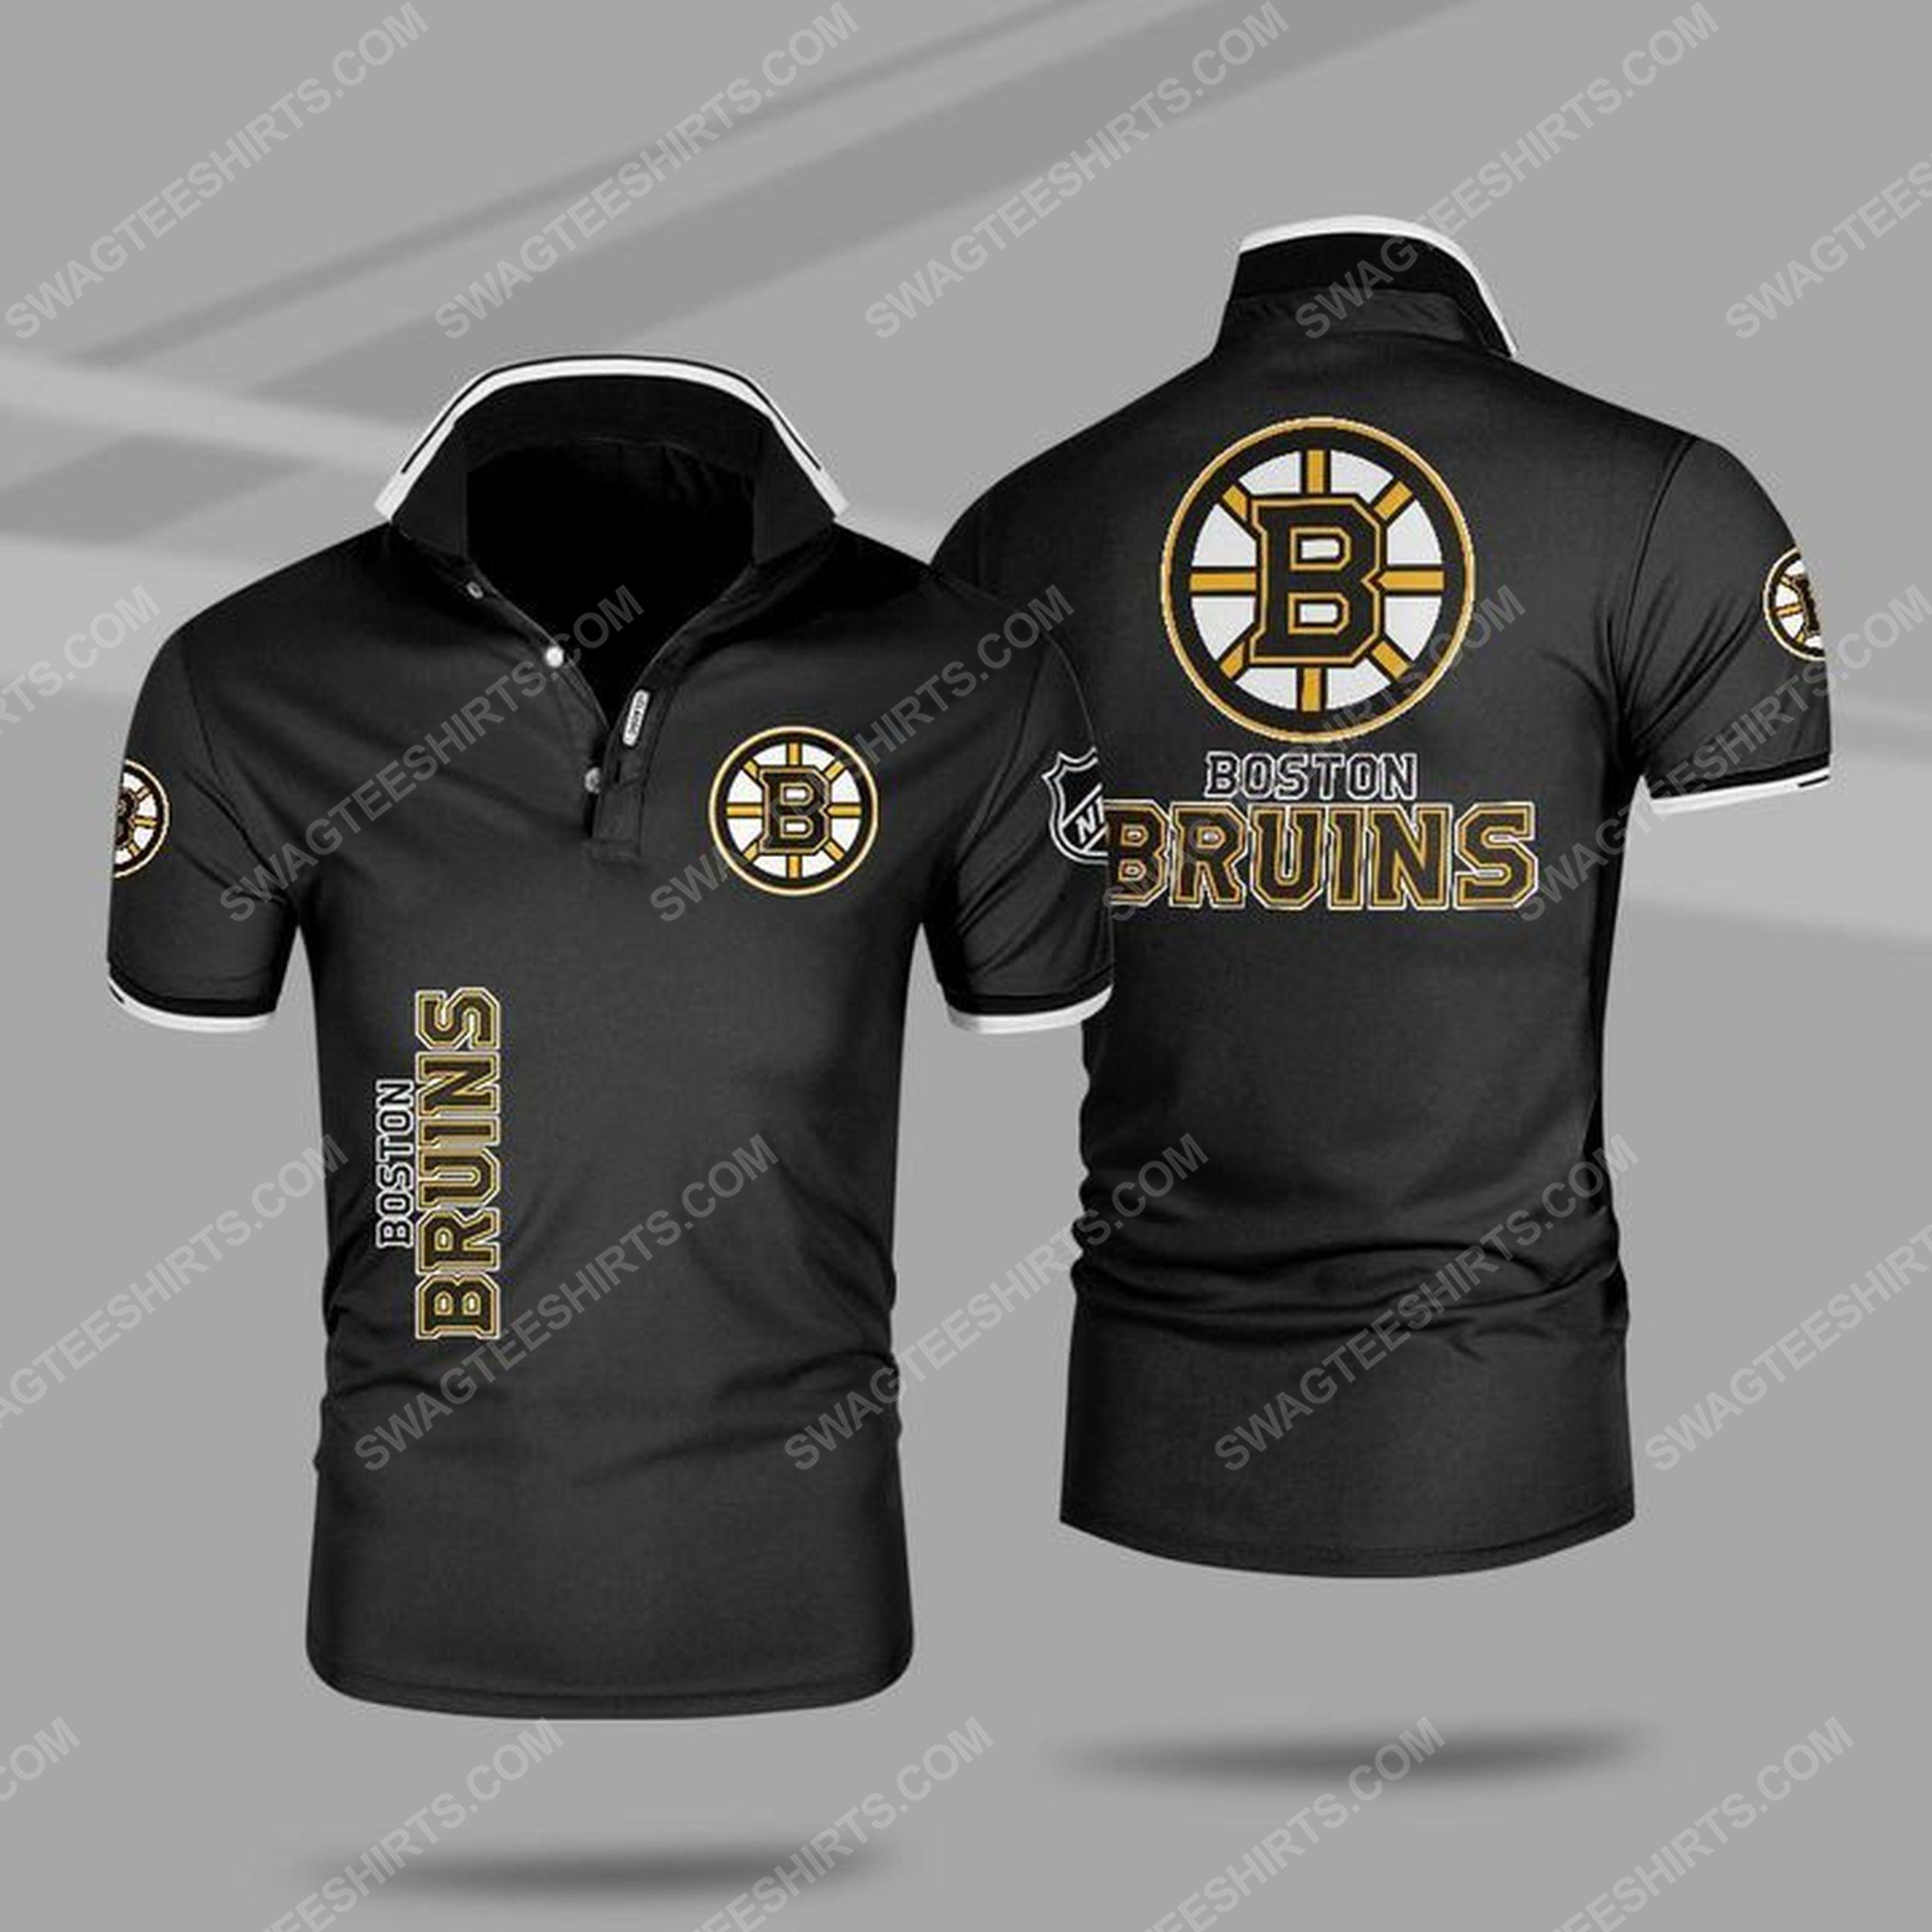 The boston bruins nhl all over print polo shirt - black 1